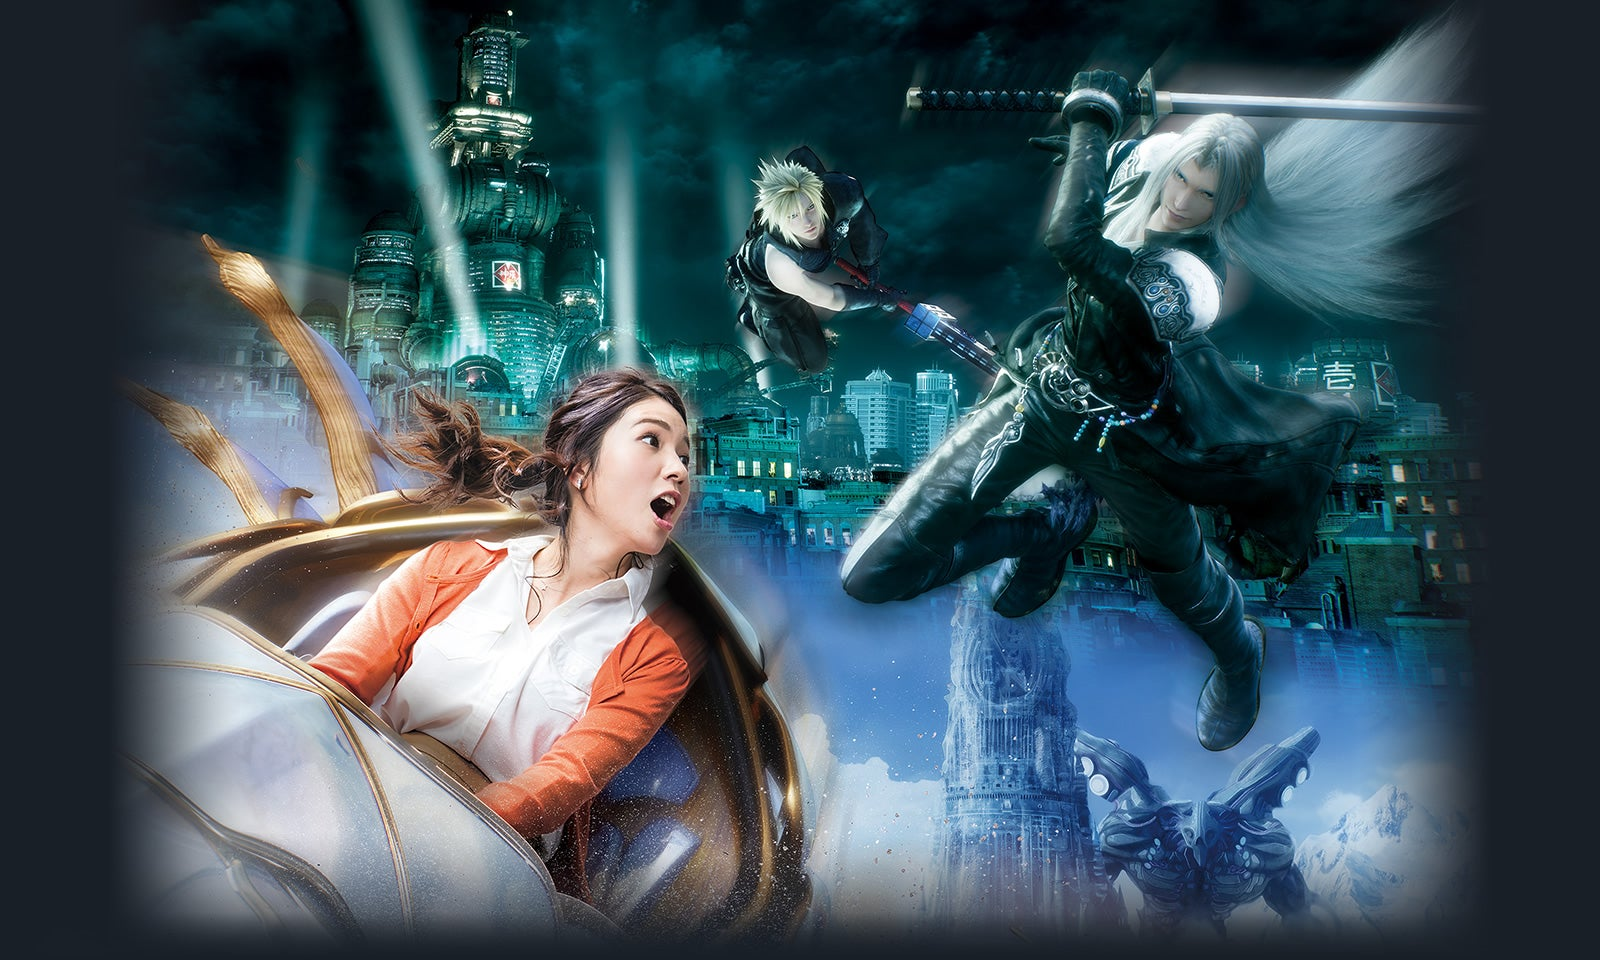 Final Fantasy Ride Coming To Universal Studios Japan In 2018